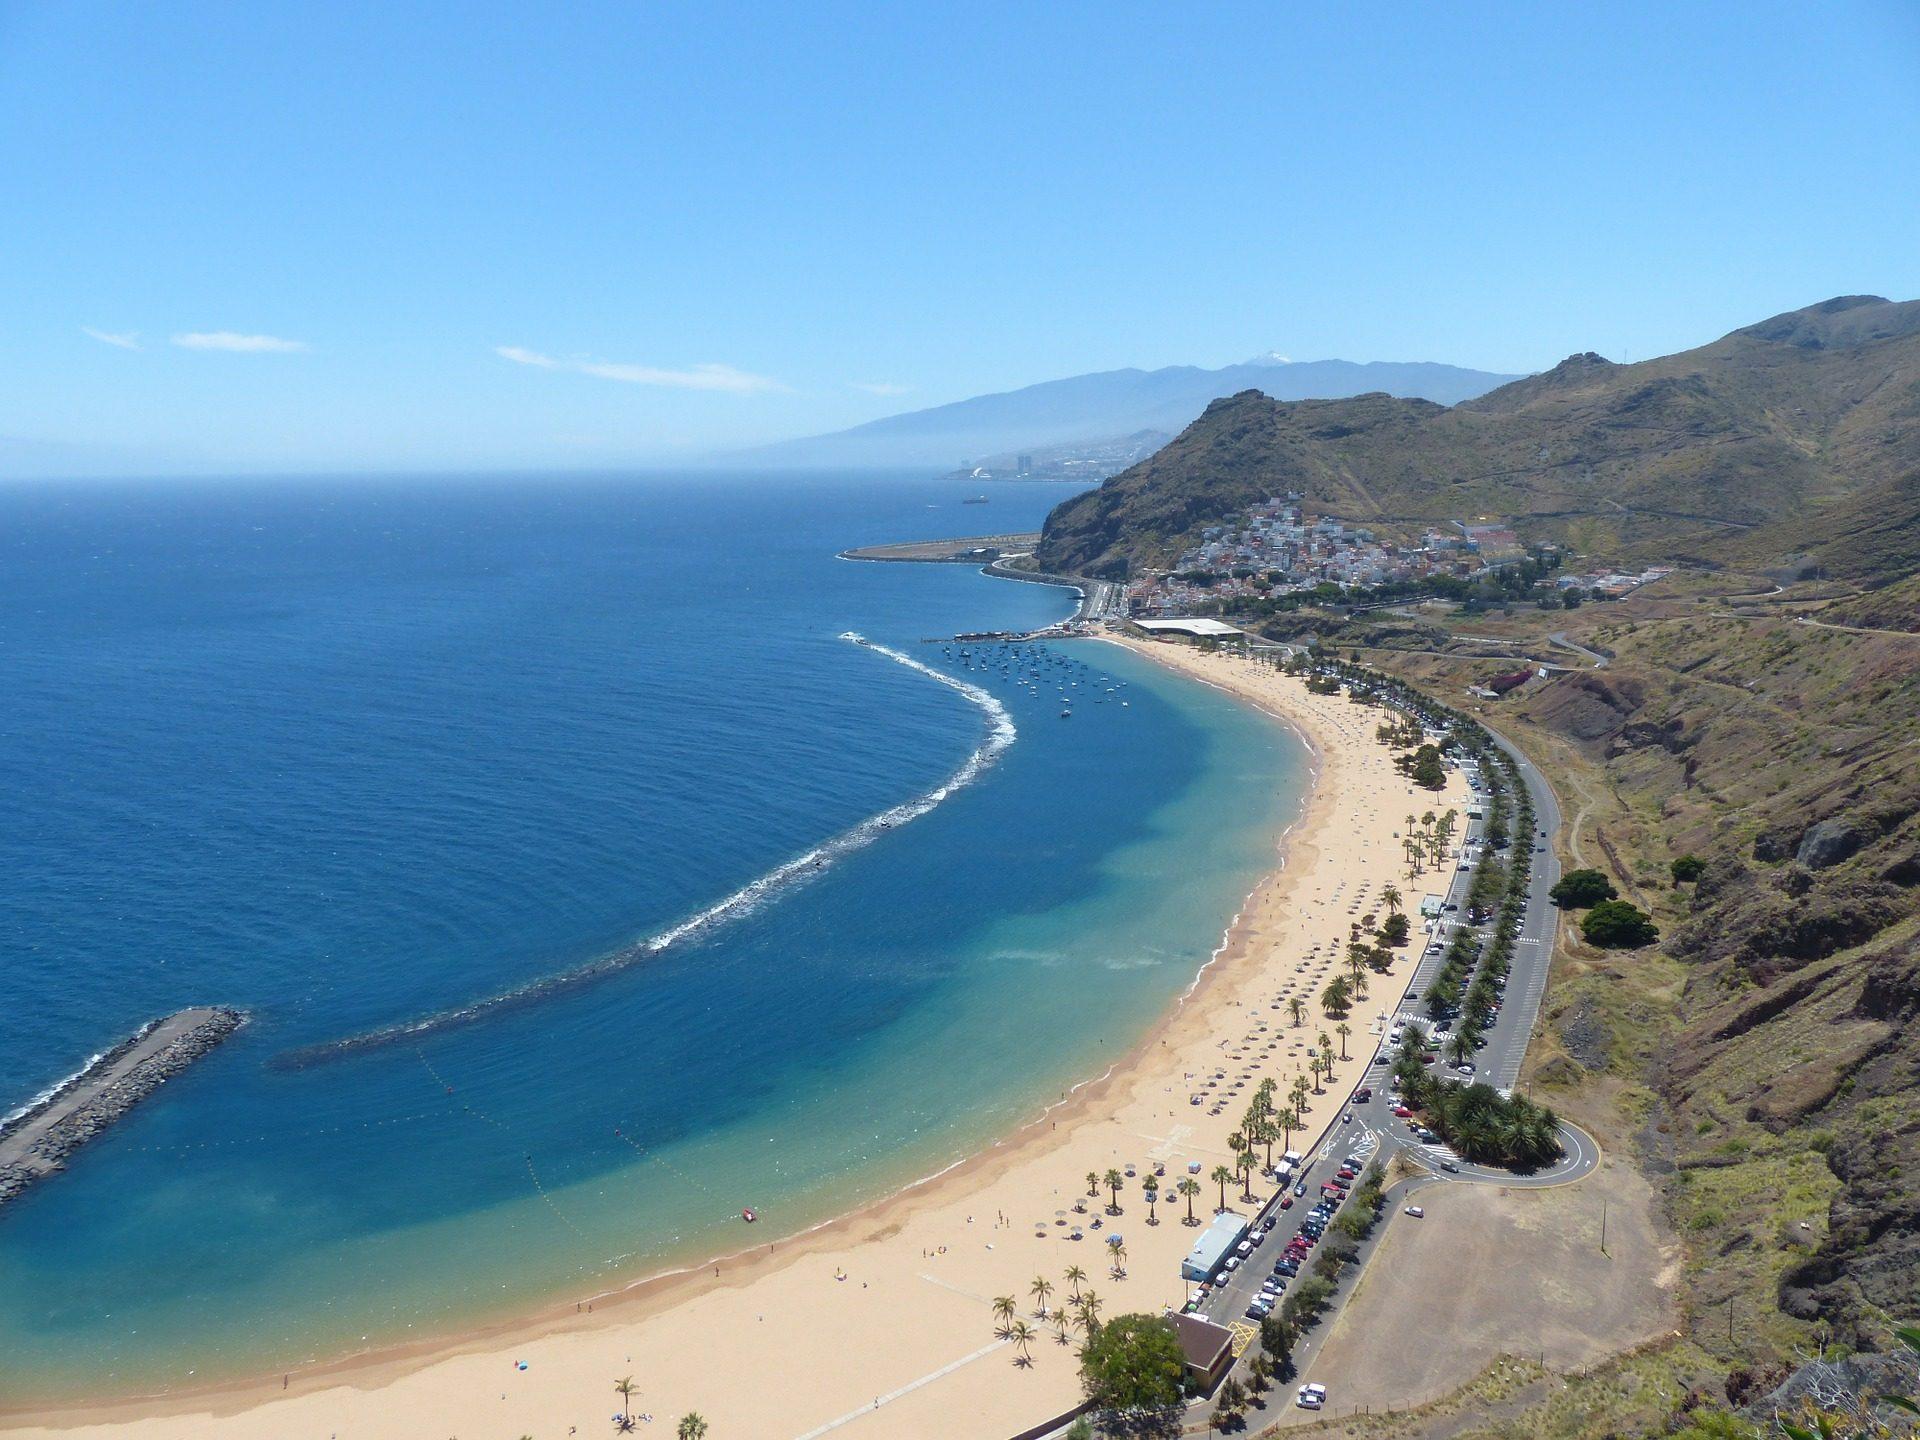 Teneriffa Urlaubsorte ab 88,00€ im Hotel Globales Acuari